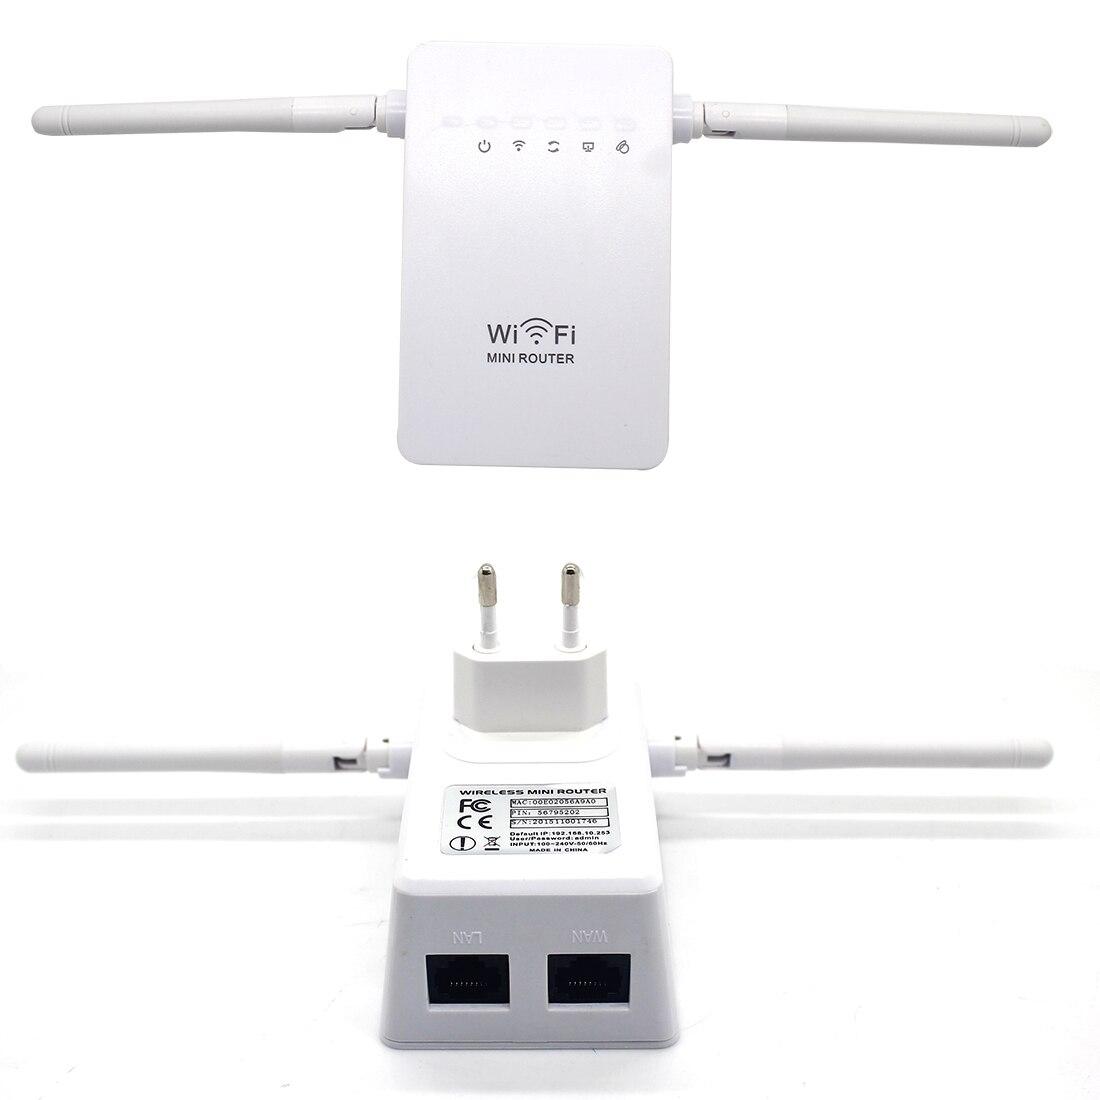 NOYOKERE Dual antenna 300Mbps Wifi Repeater Wireless Range Extender 802.11N Booster Signal Amplifier wlan EU